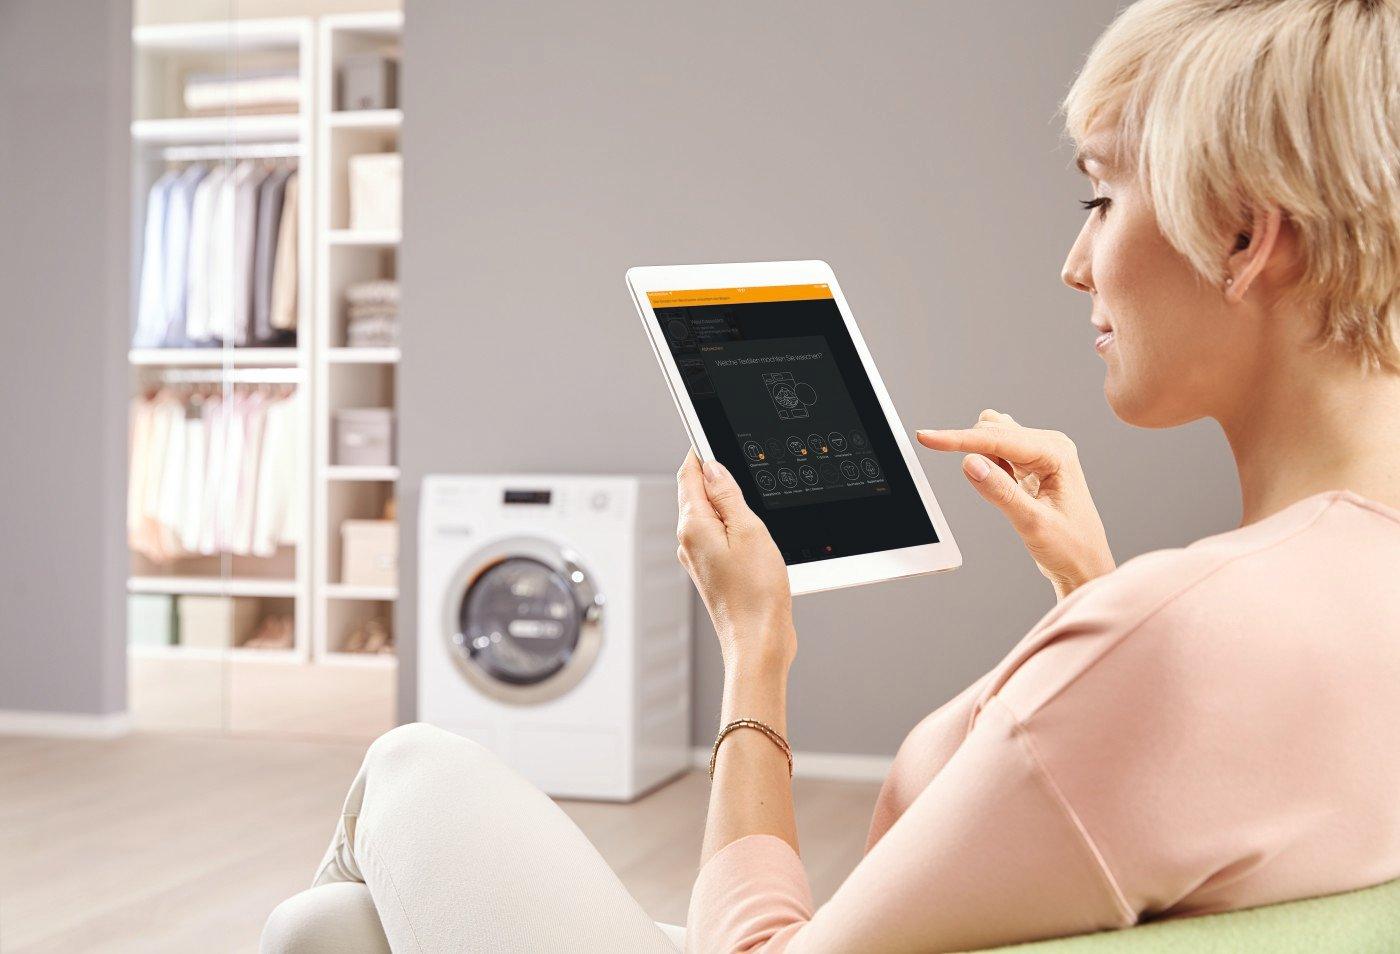 das sind die wichtigsten smart home standards androidpit. Black Bedroom Furniture Sets. Home Design Ideas